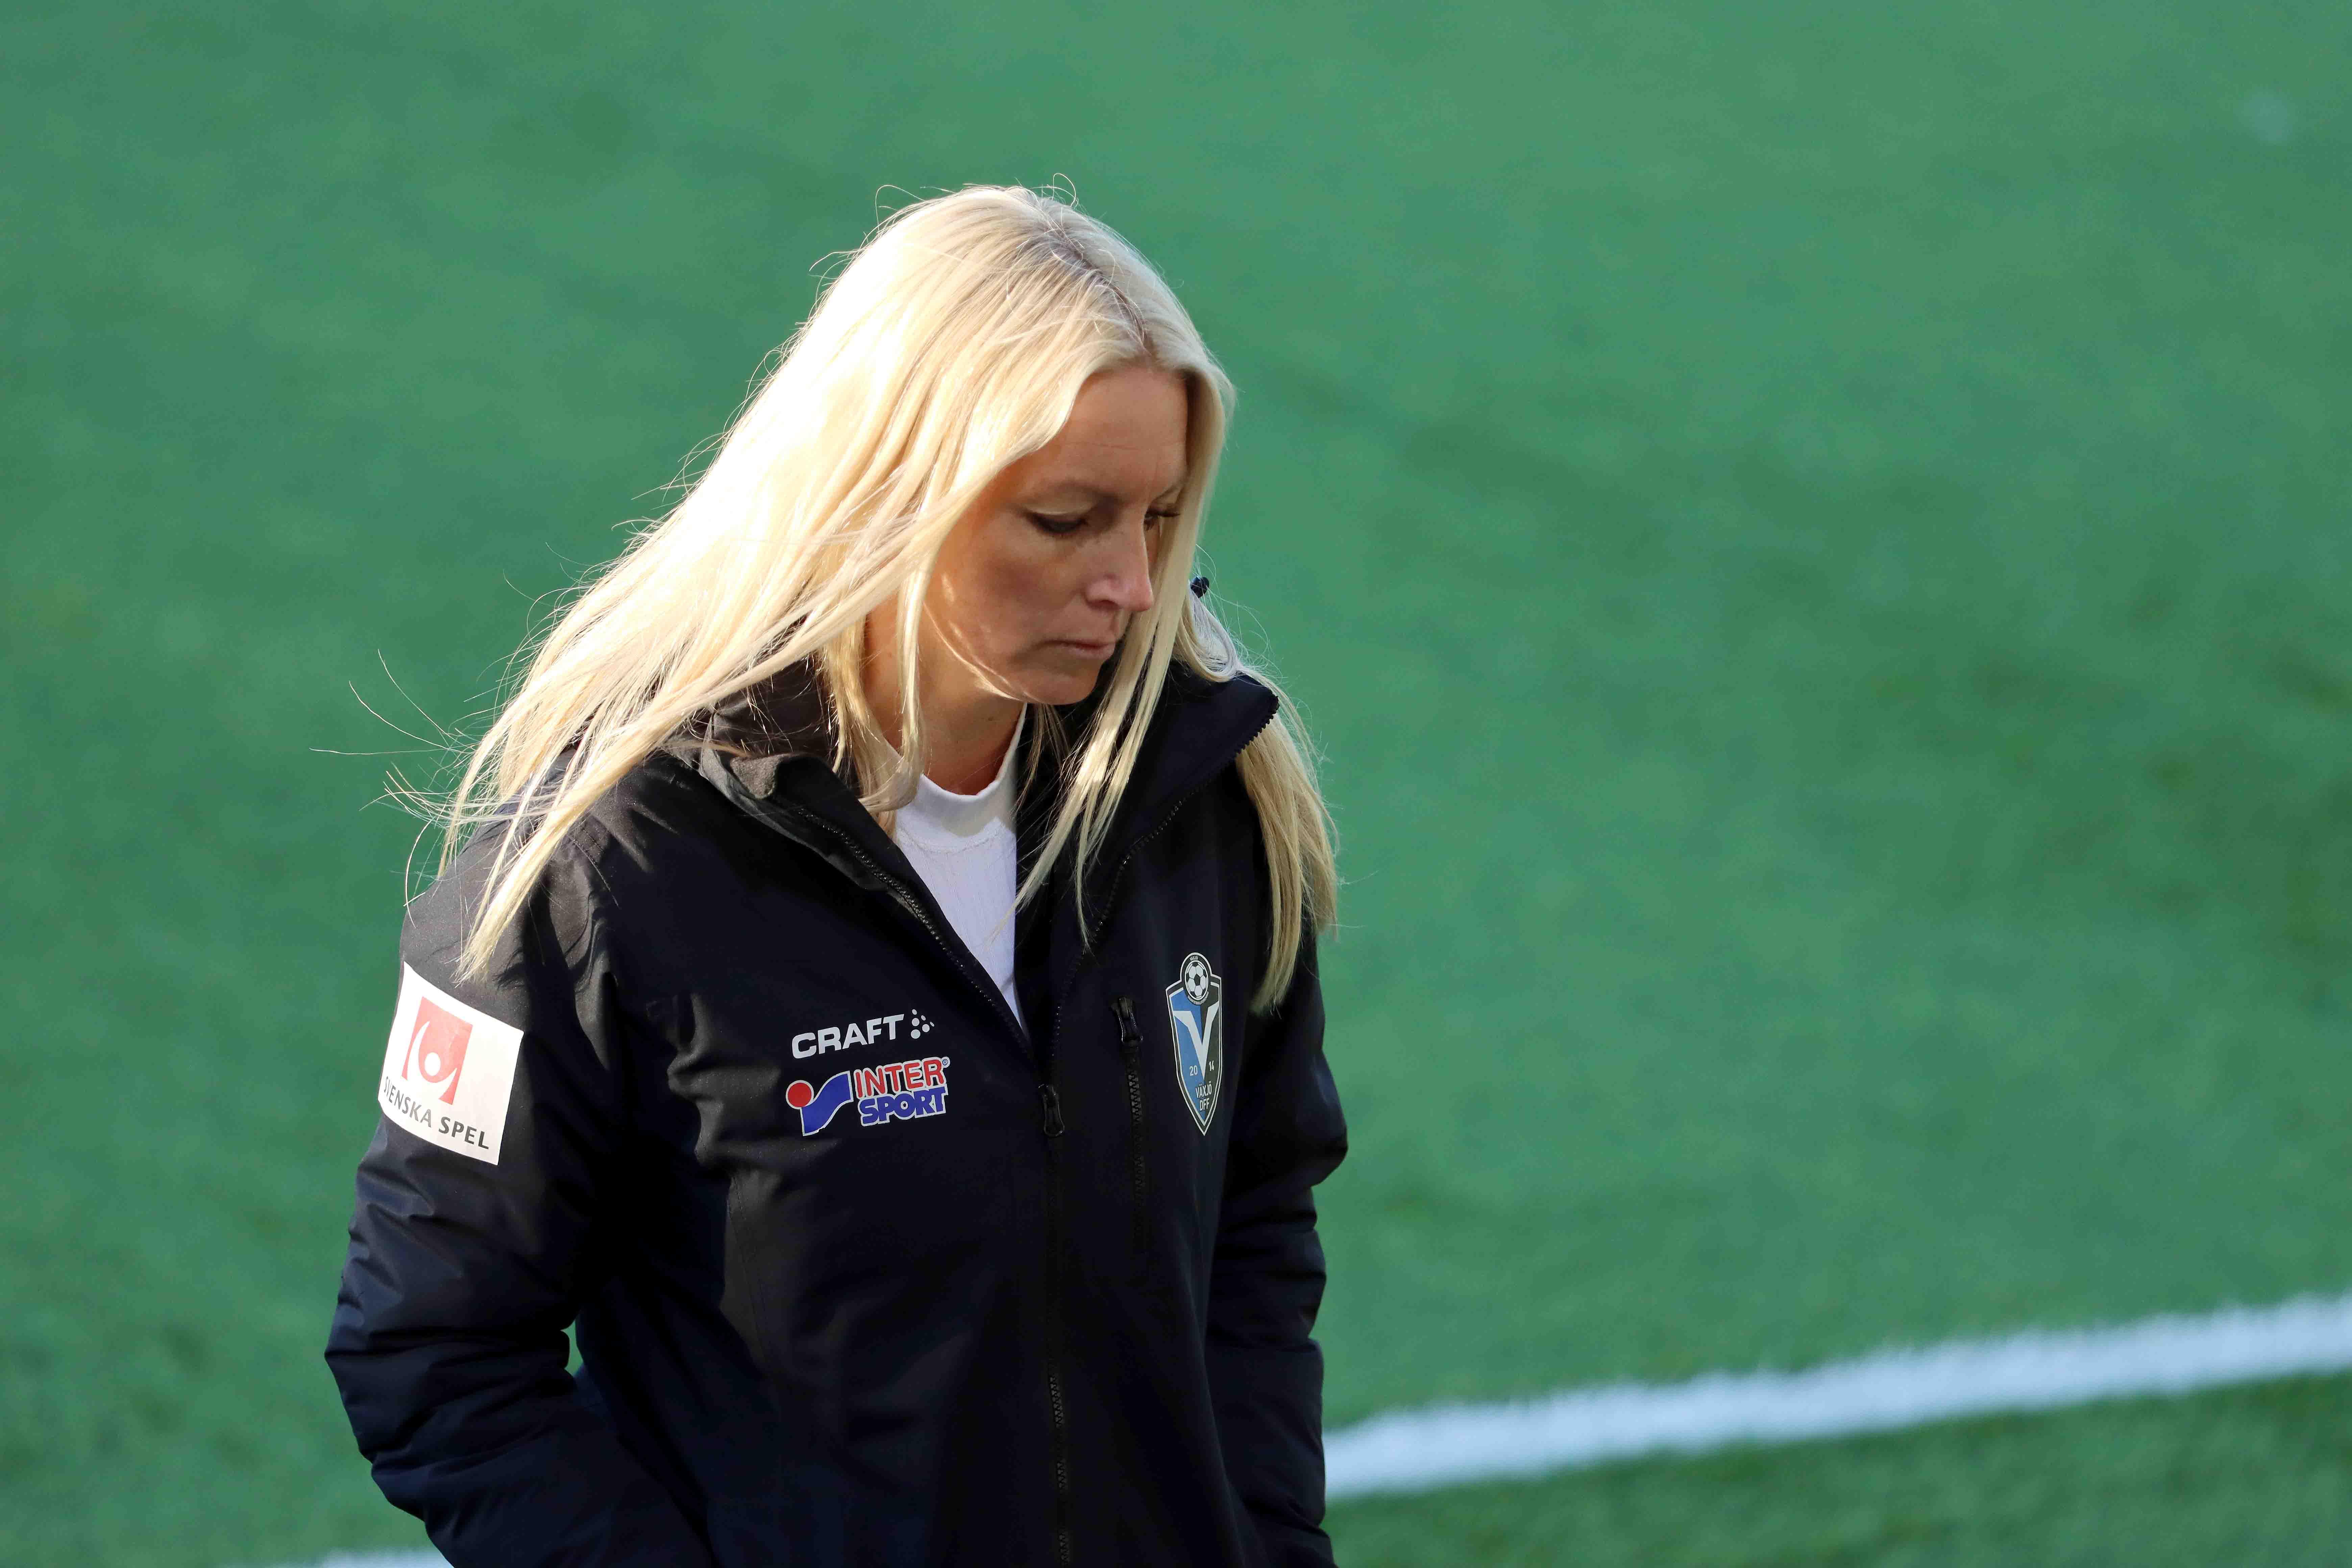 Maria Nilsson sol i håret